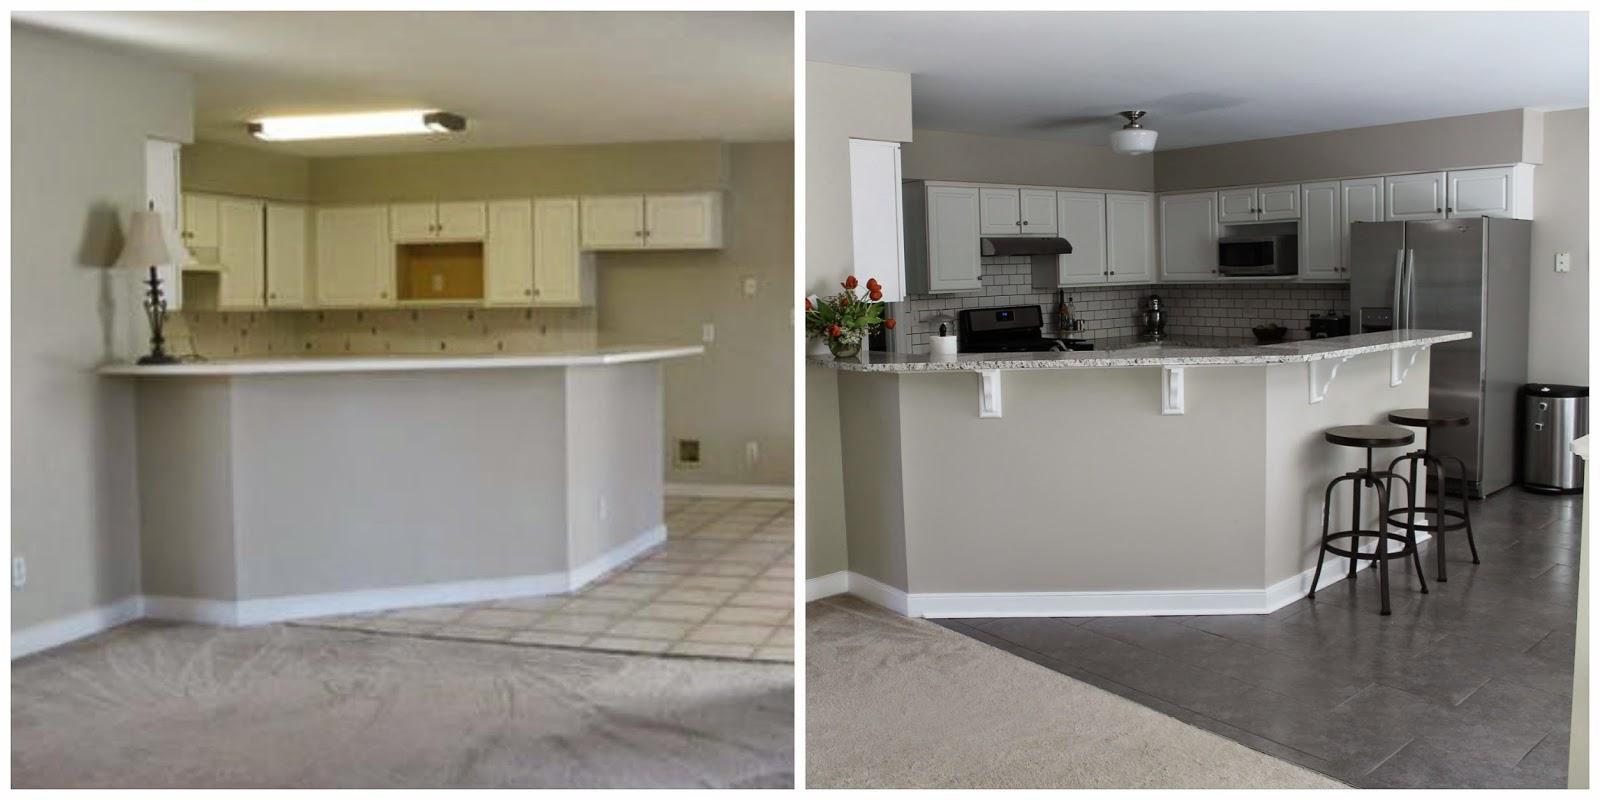 Lighting Ideas | Interior Lighting Ideas | HouseLogic Home ...